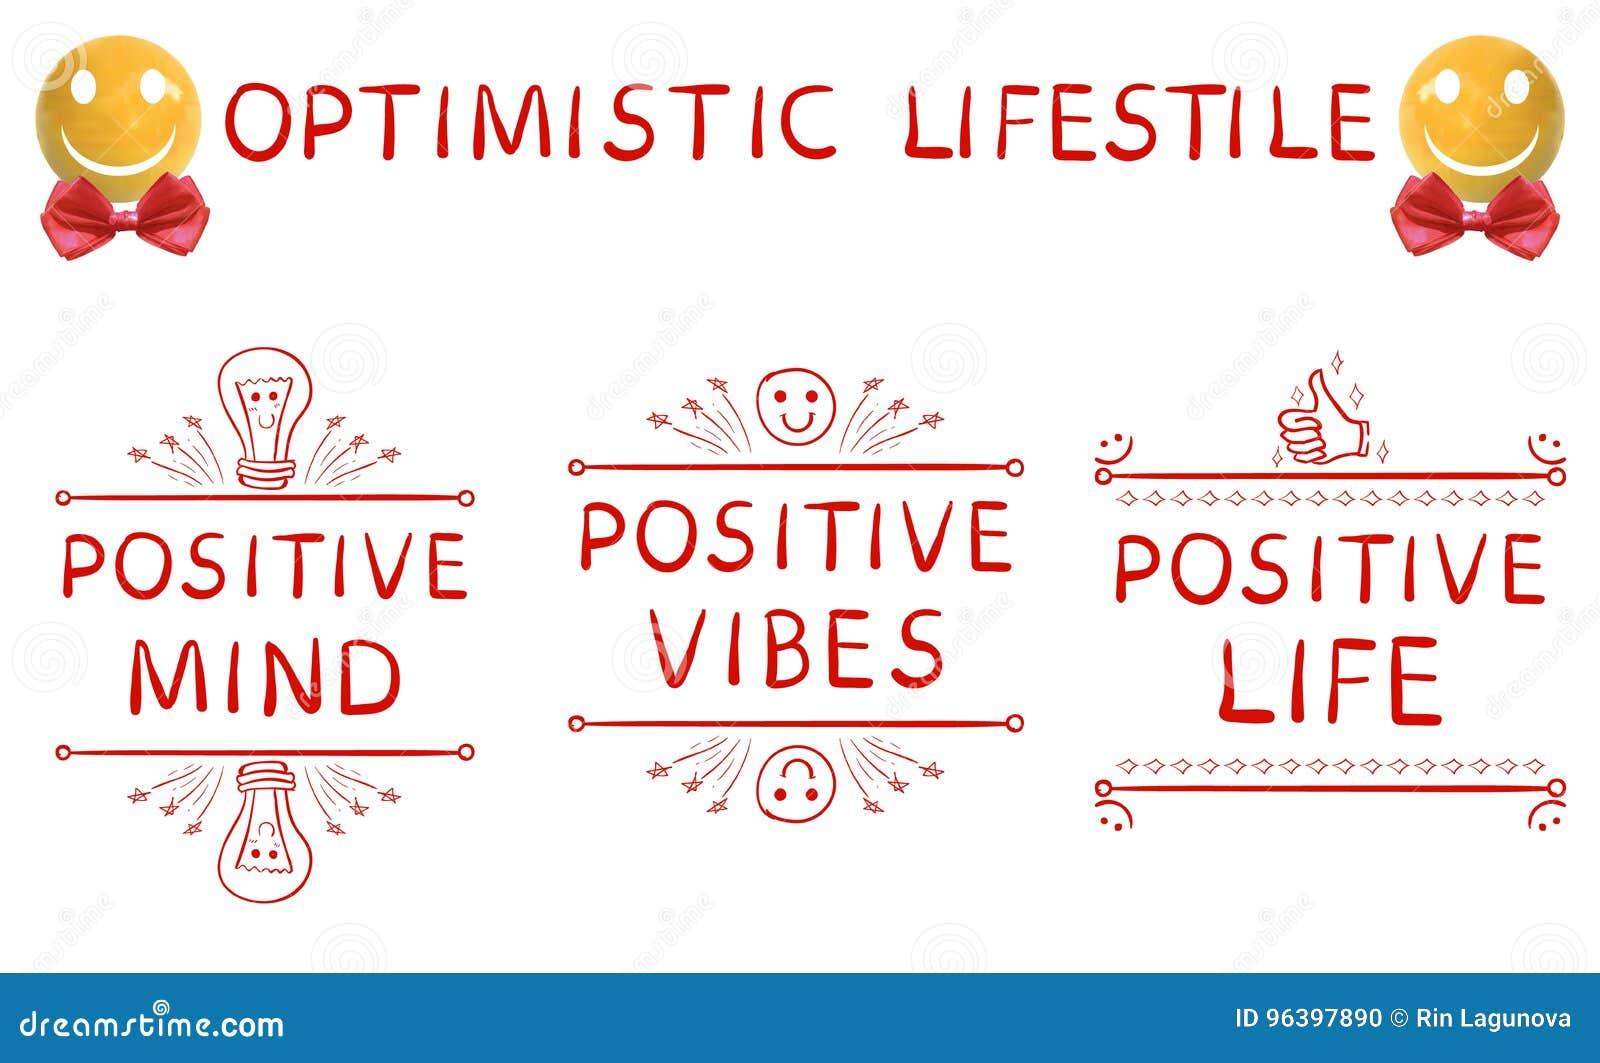 Optimistic Lifestyle Positive Mind Positive Vibes Positive Life